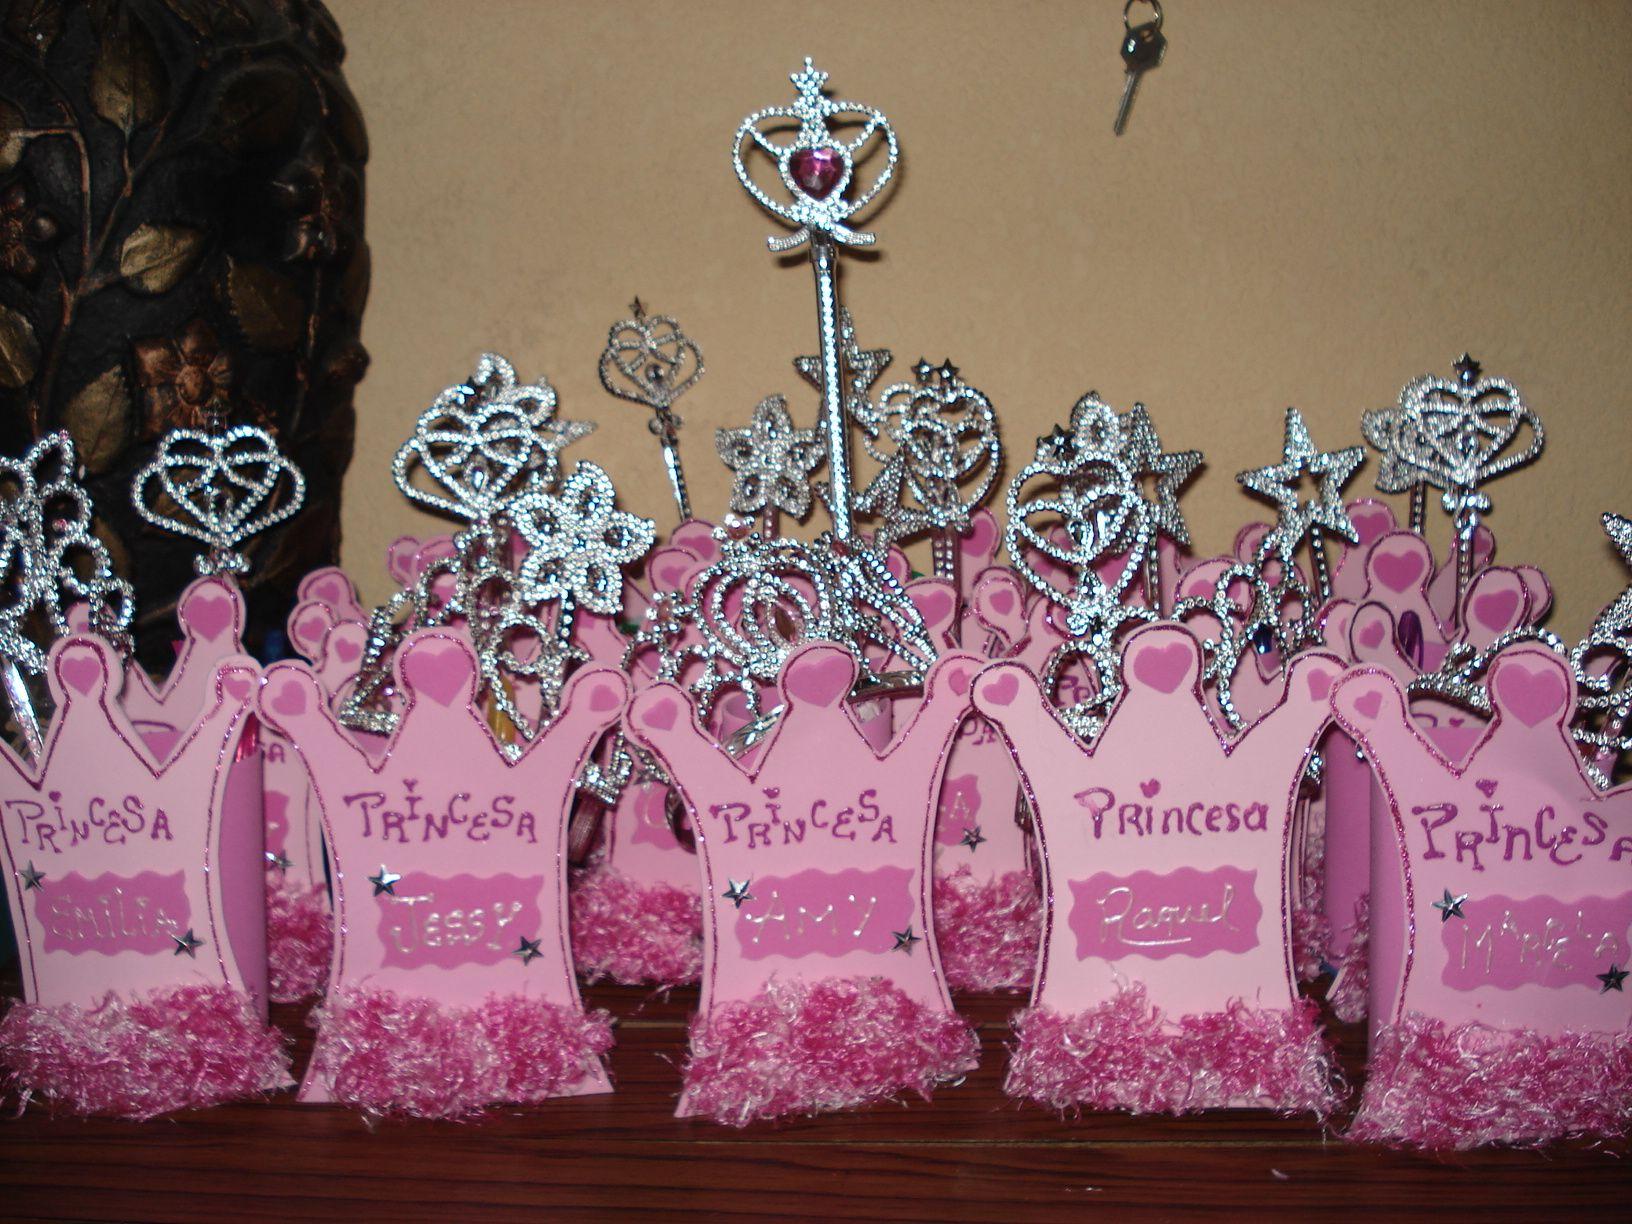 Fiesta de princesas sorpresa corona fiestaideas - Fiestas de cumpleanos de princesas ...